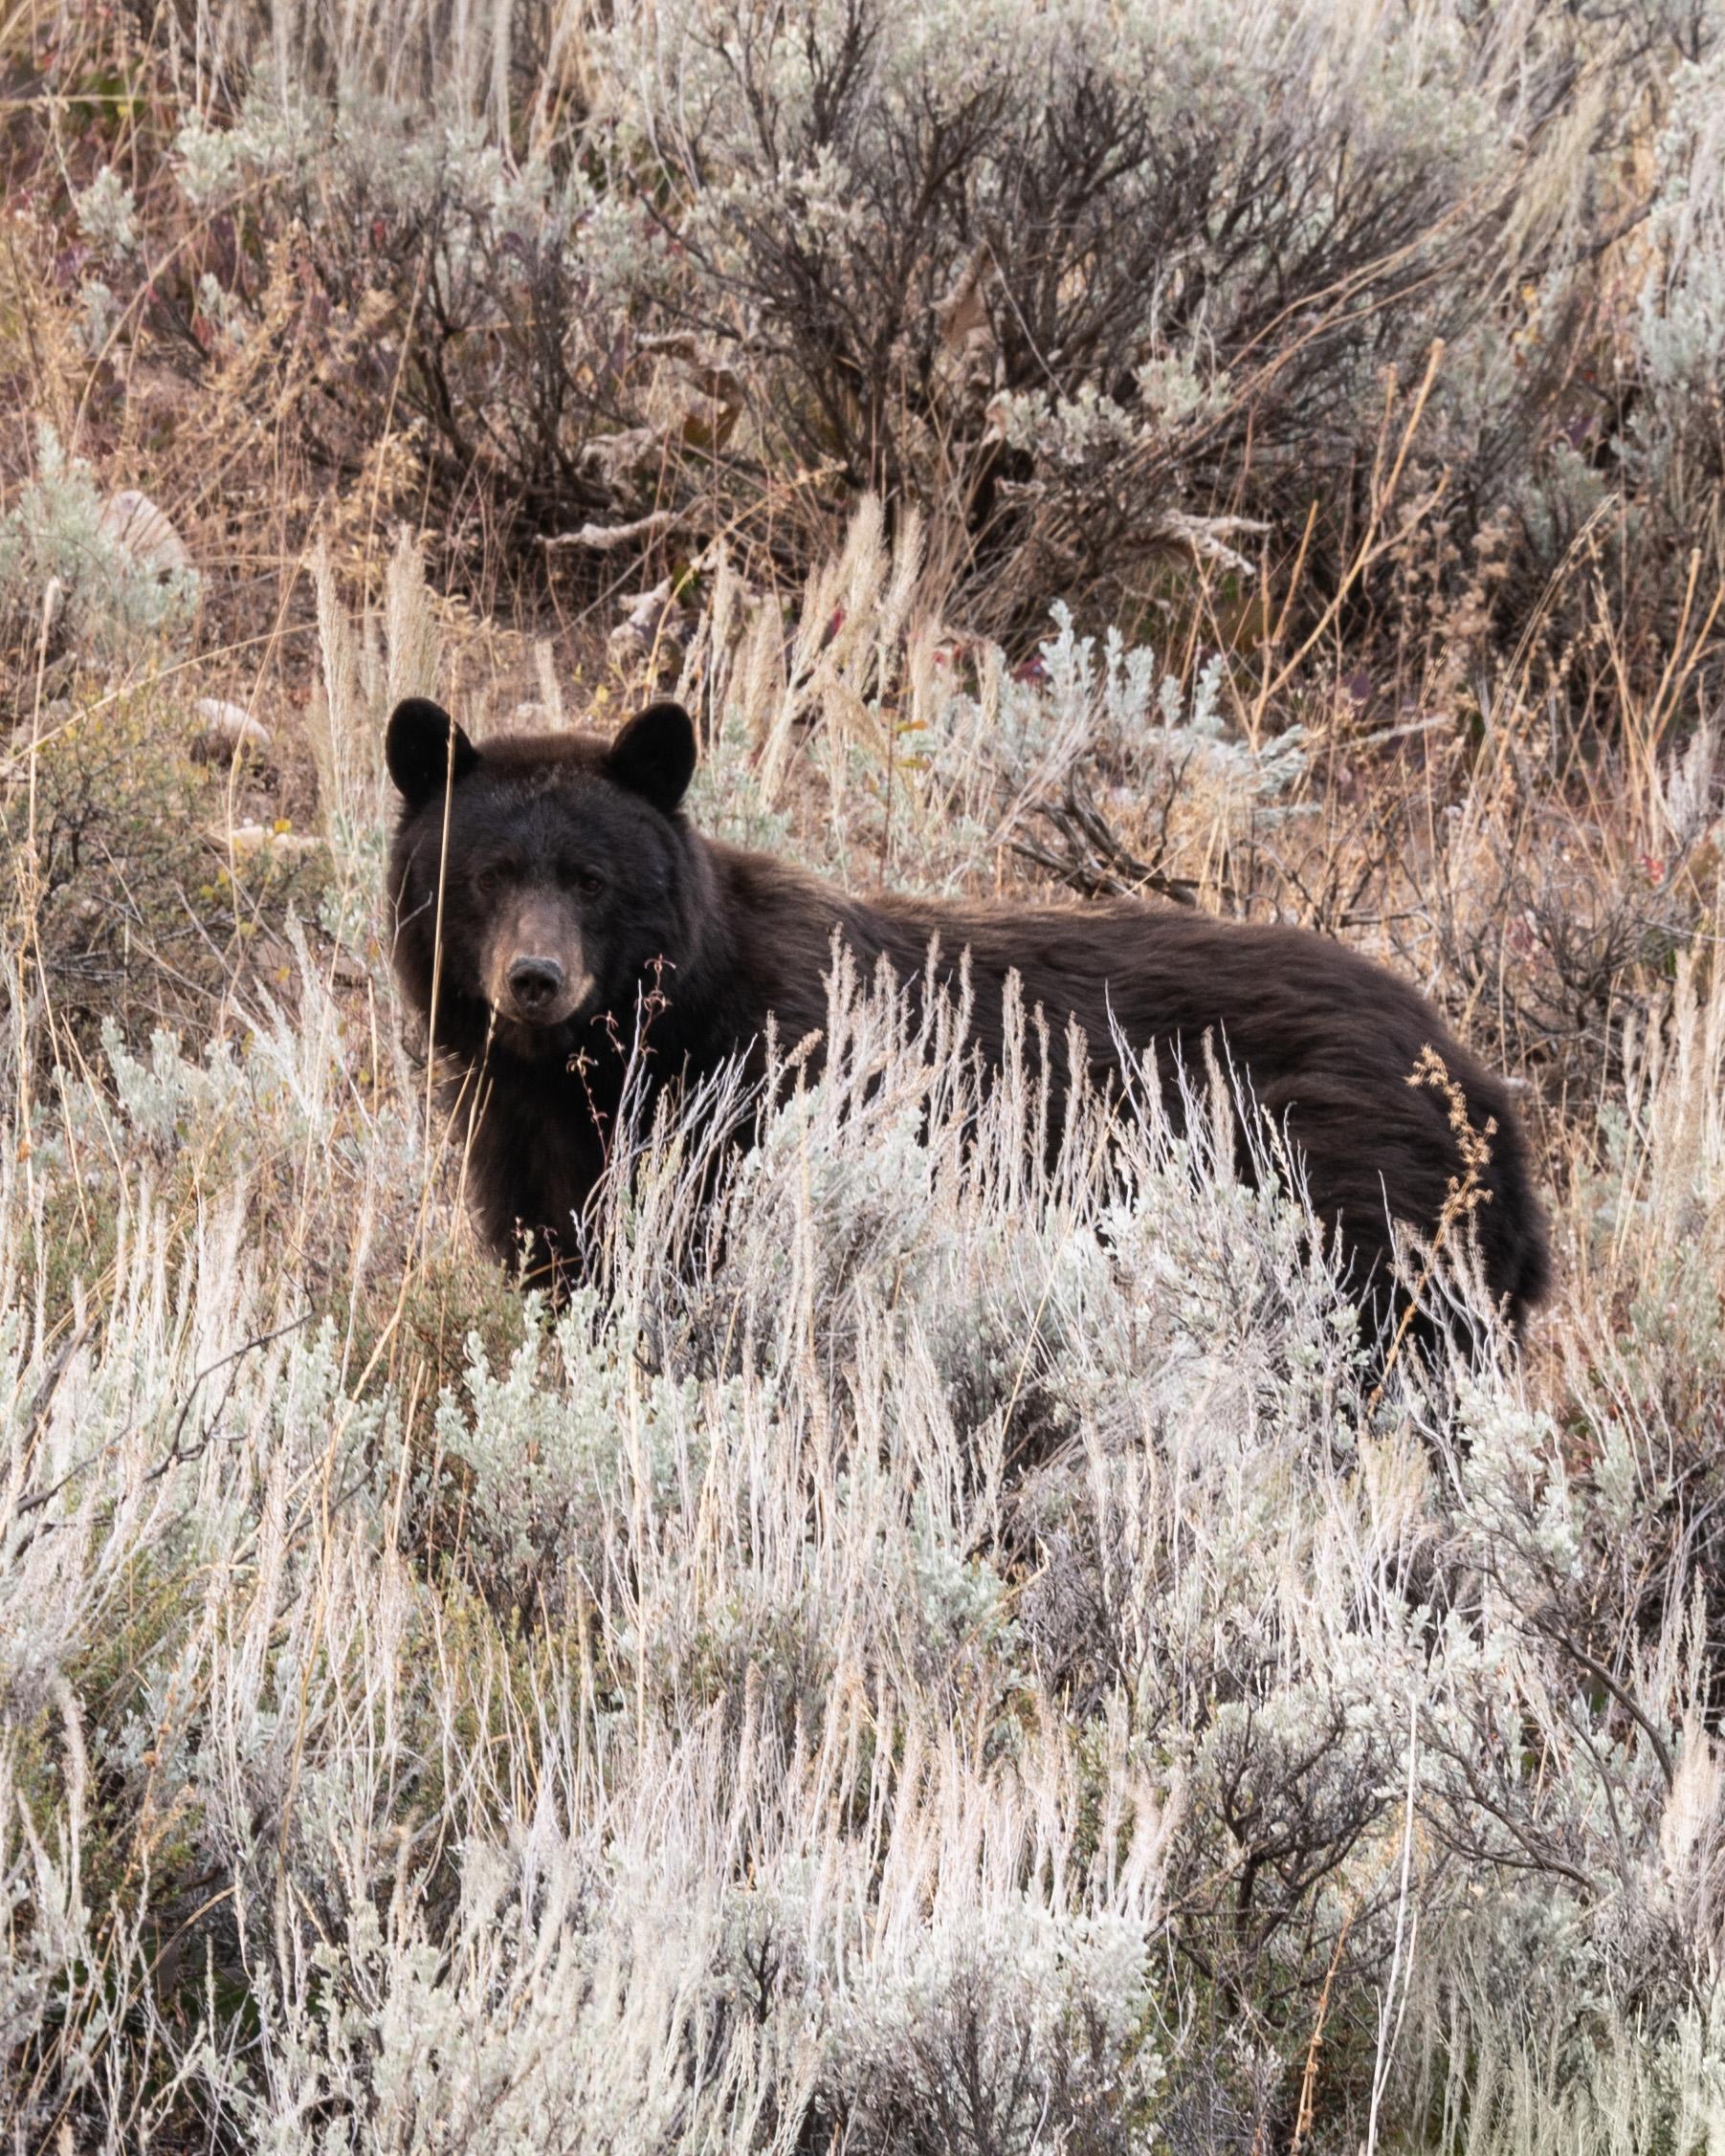 #bear, #grandtetonnationalpark, #grandtetons, #nationalpark, #wildlife, #sony, #RRS, #tripod, #staysafe, #keepyourdistance